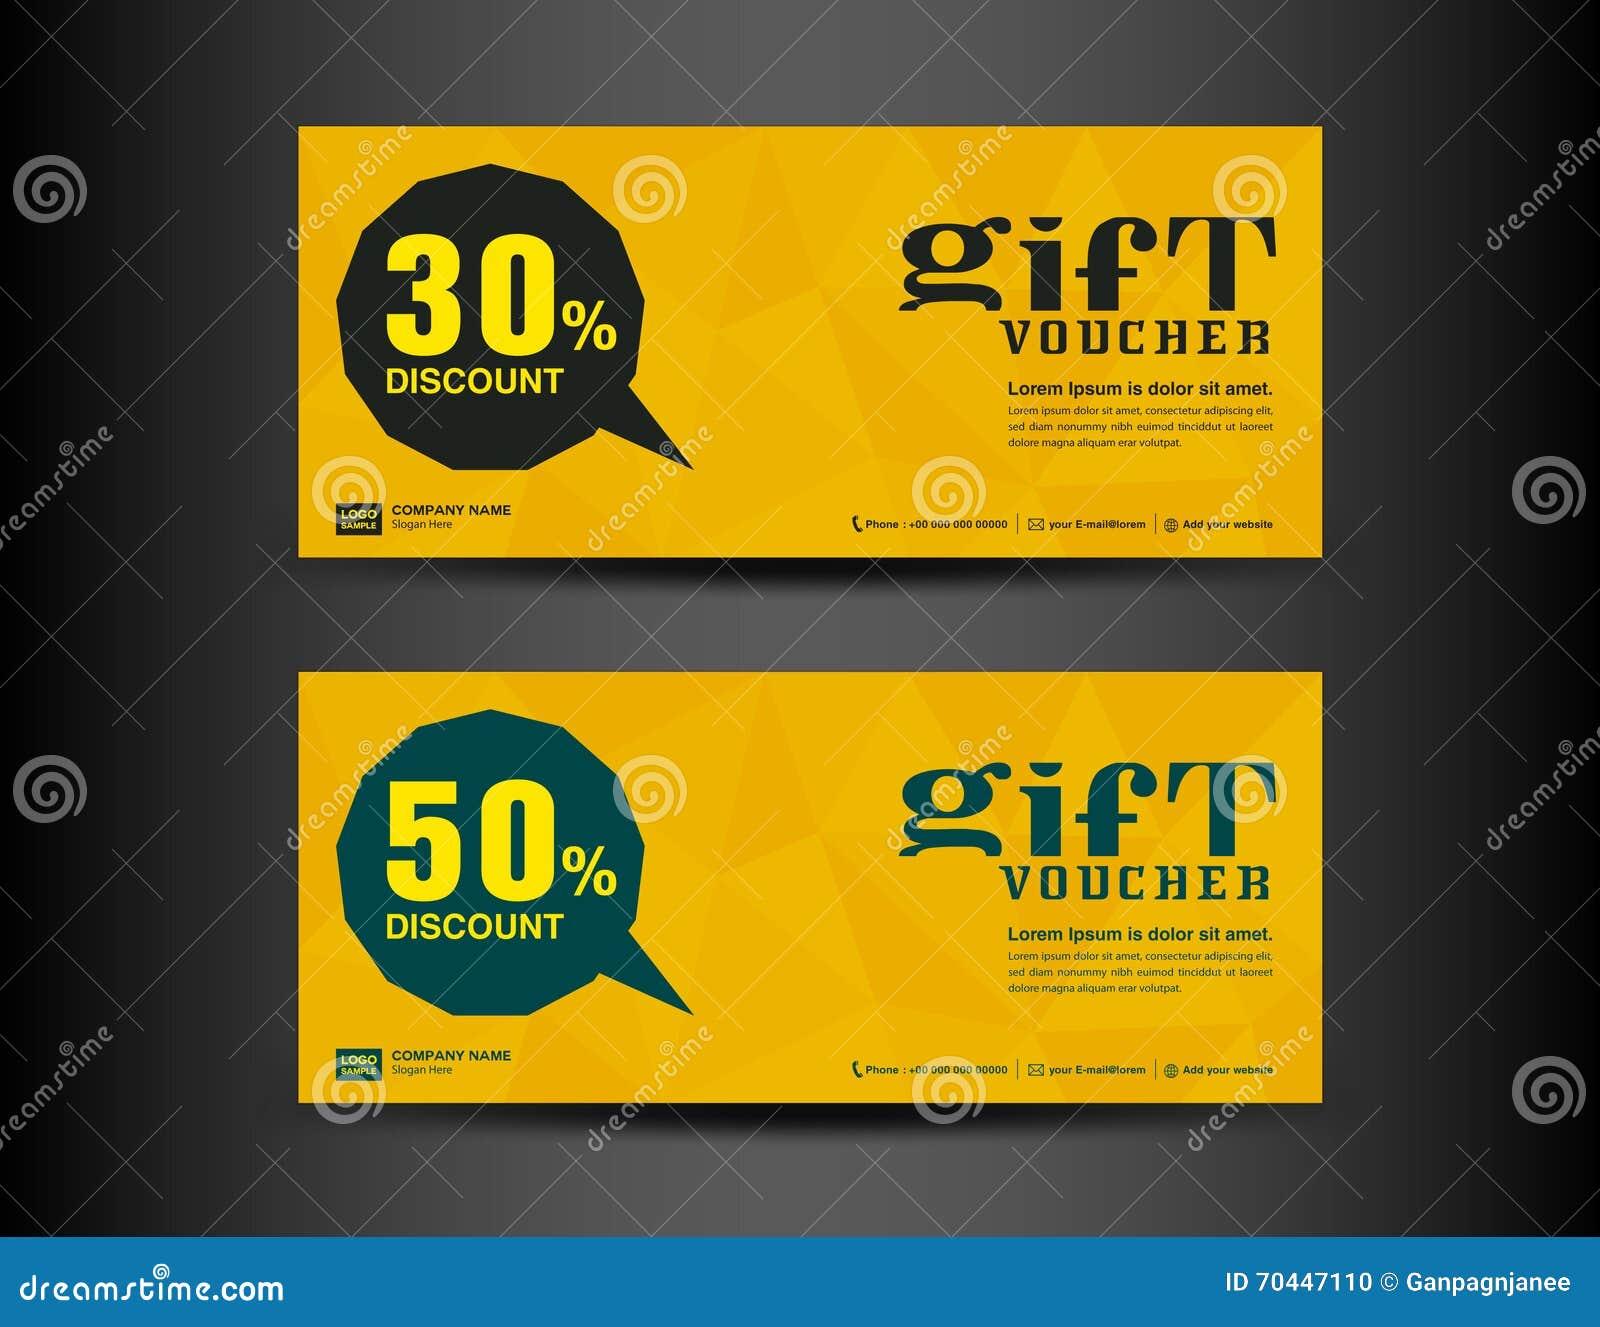 Discount Voucher Template Coupon Designticket Banner Template – Ticket Voucher Template